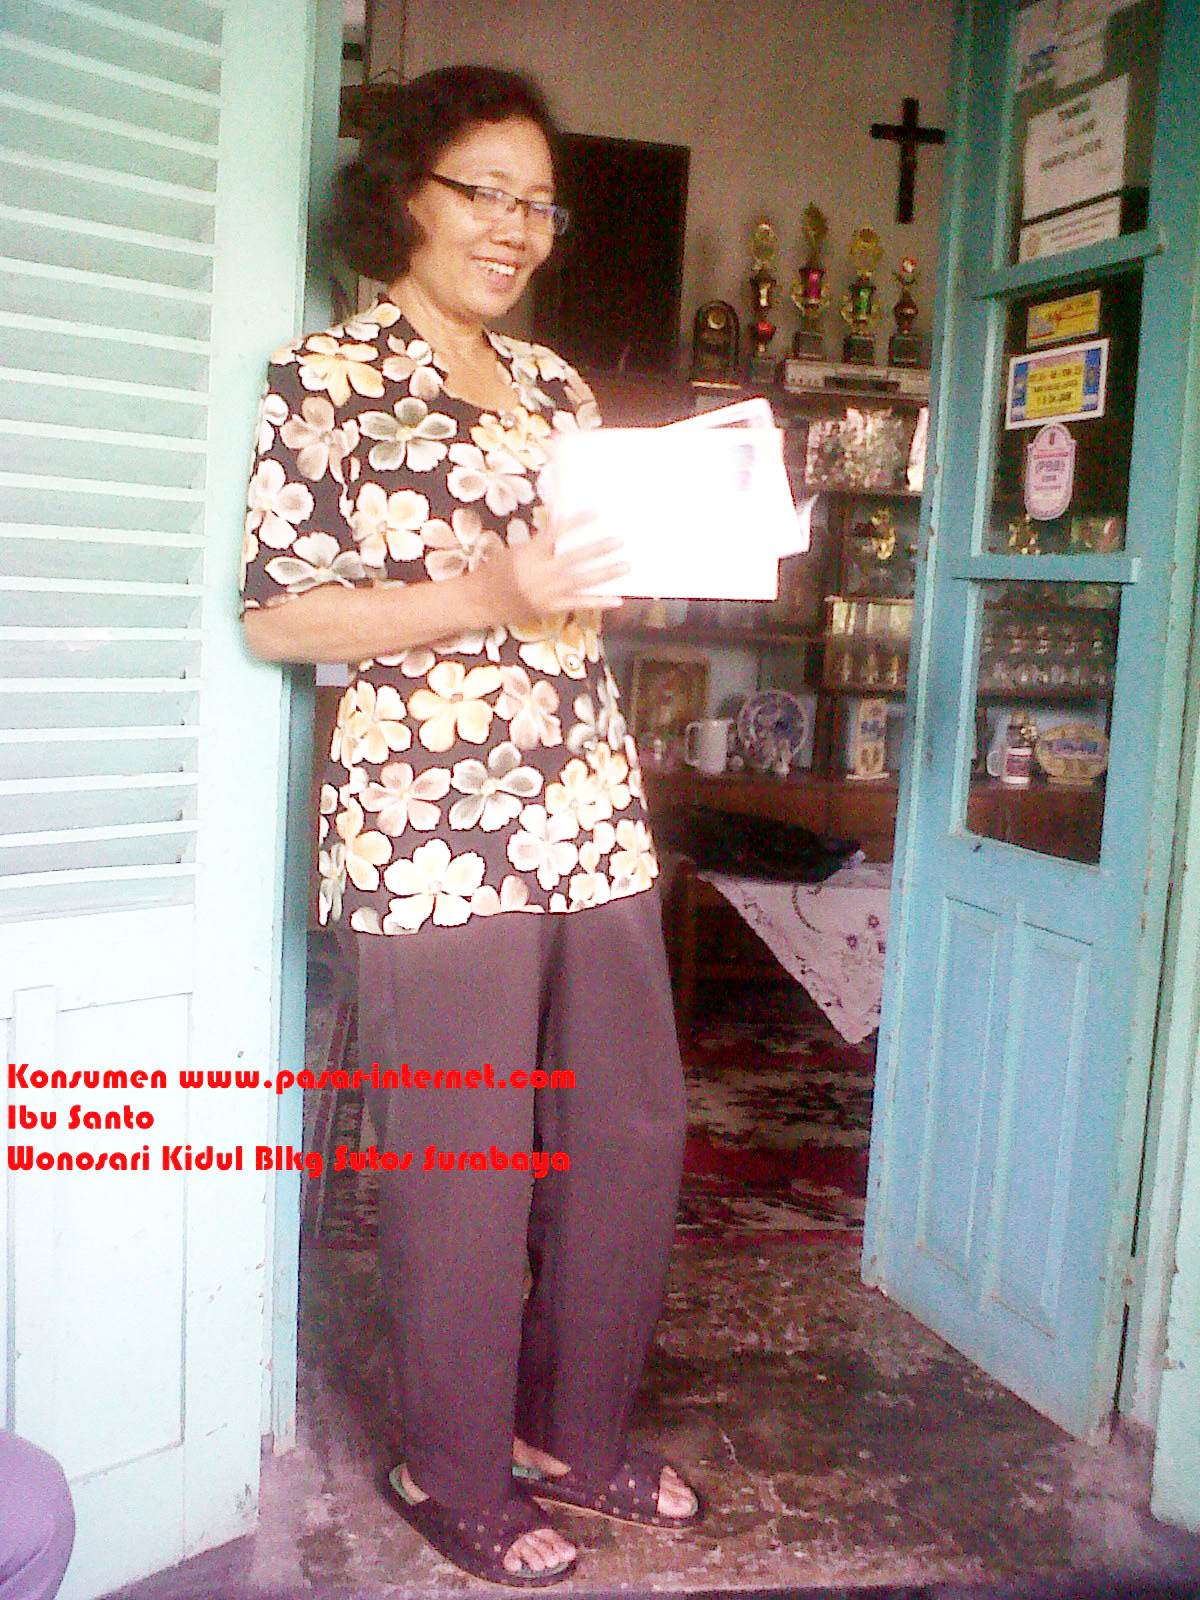 Konsumen Pasar Internet Indonesia